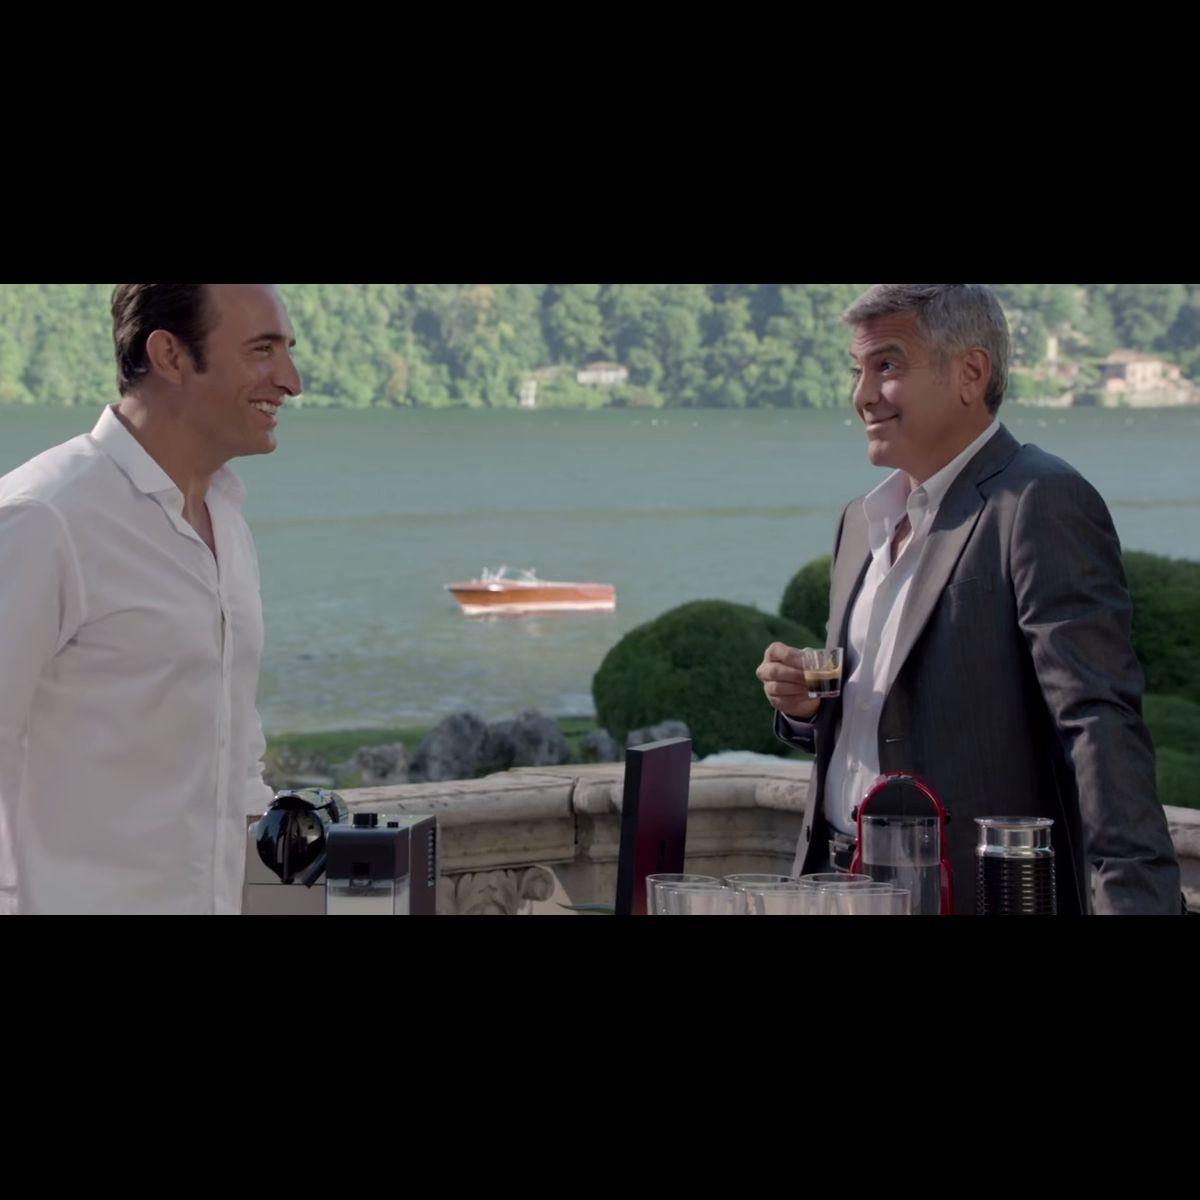 Jean dujardin rejoint george clooney dans la pub nespresso for Jean luc dujardin